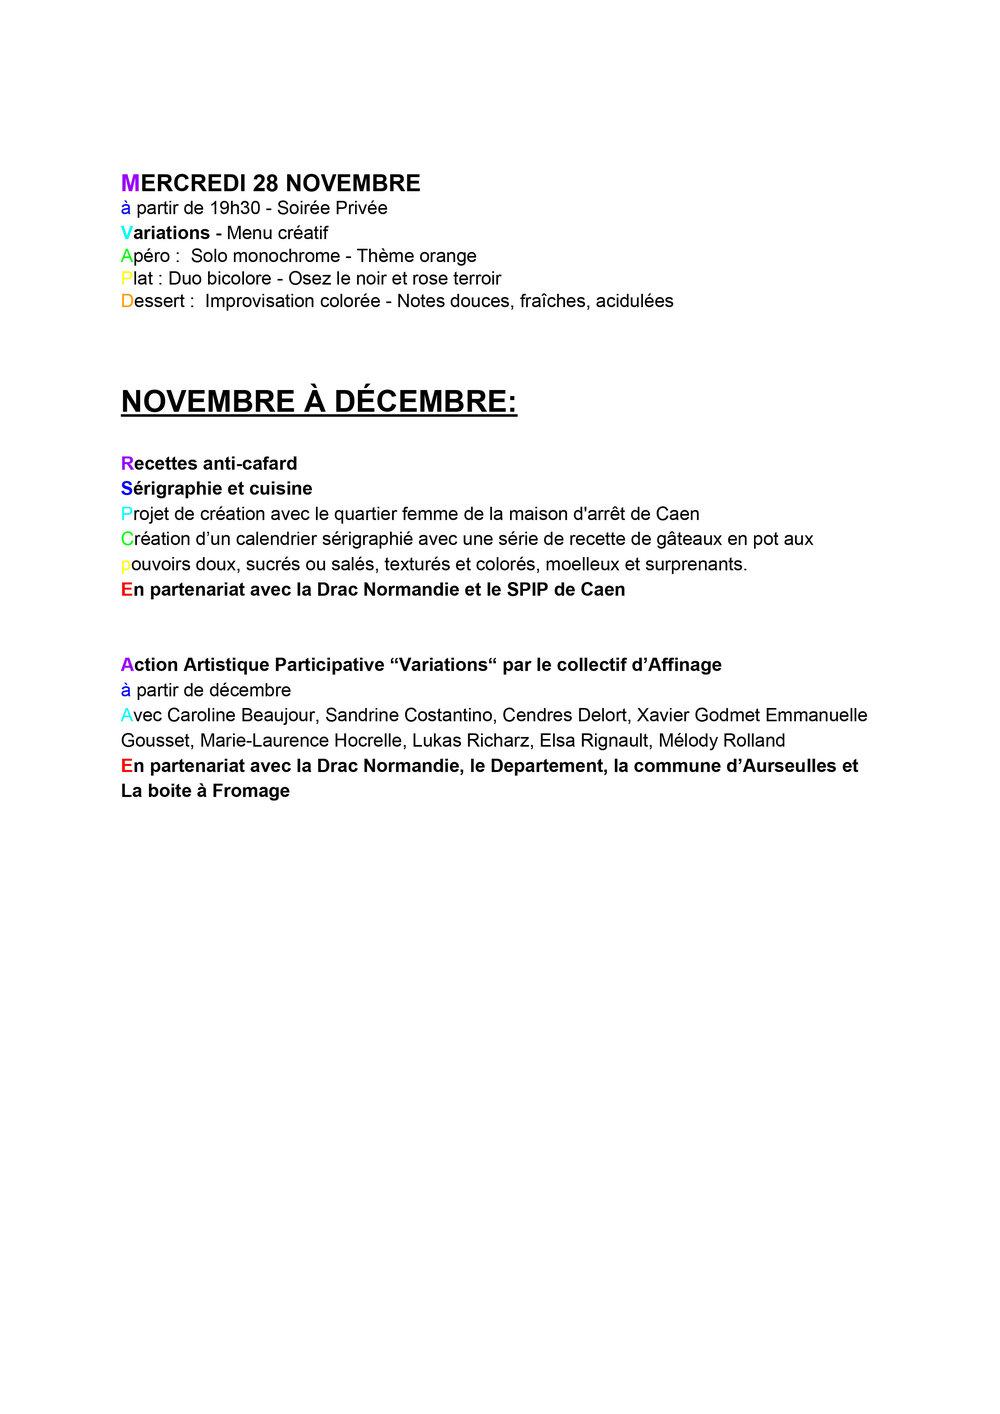 AGENDA Nov-Dec 2018-2.jpg